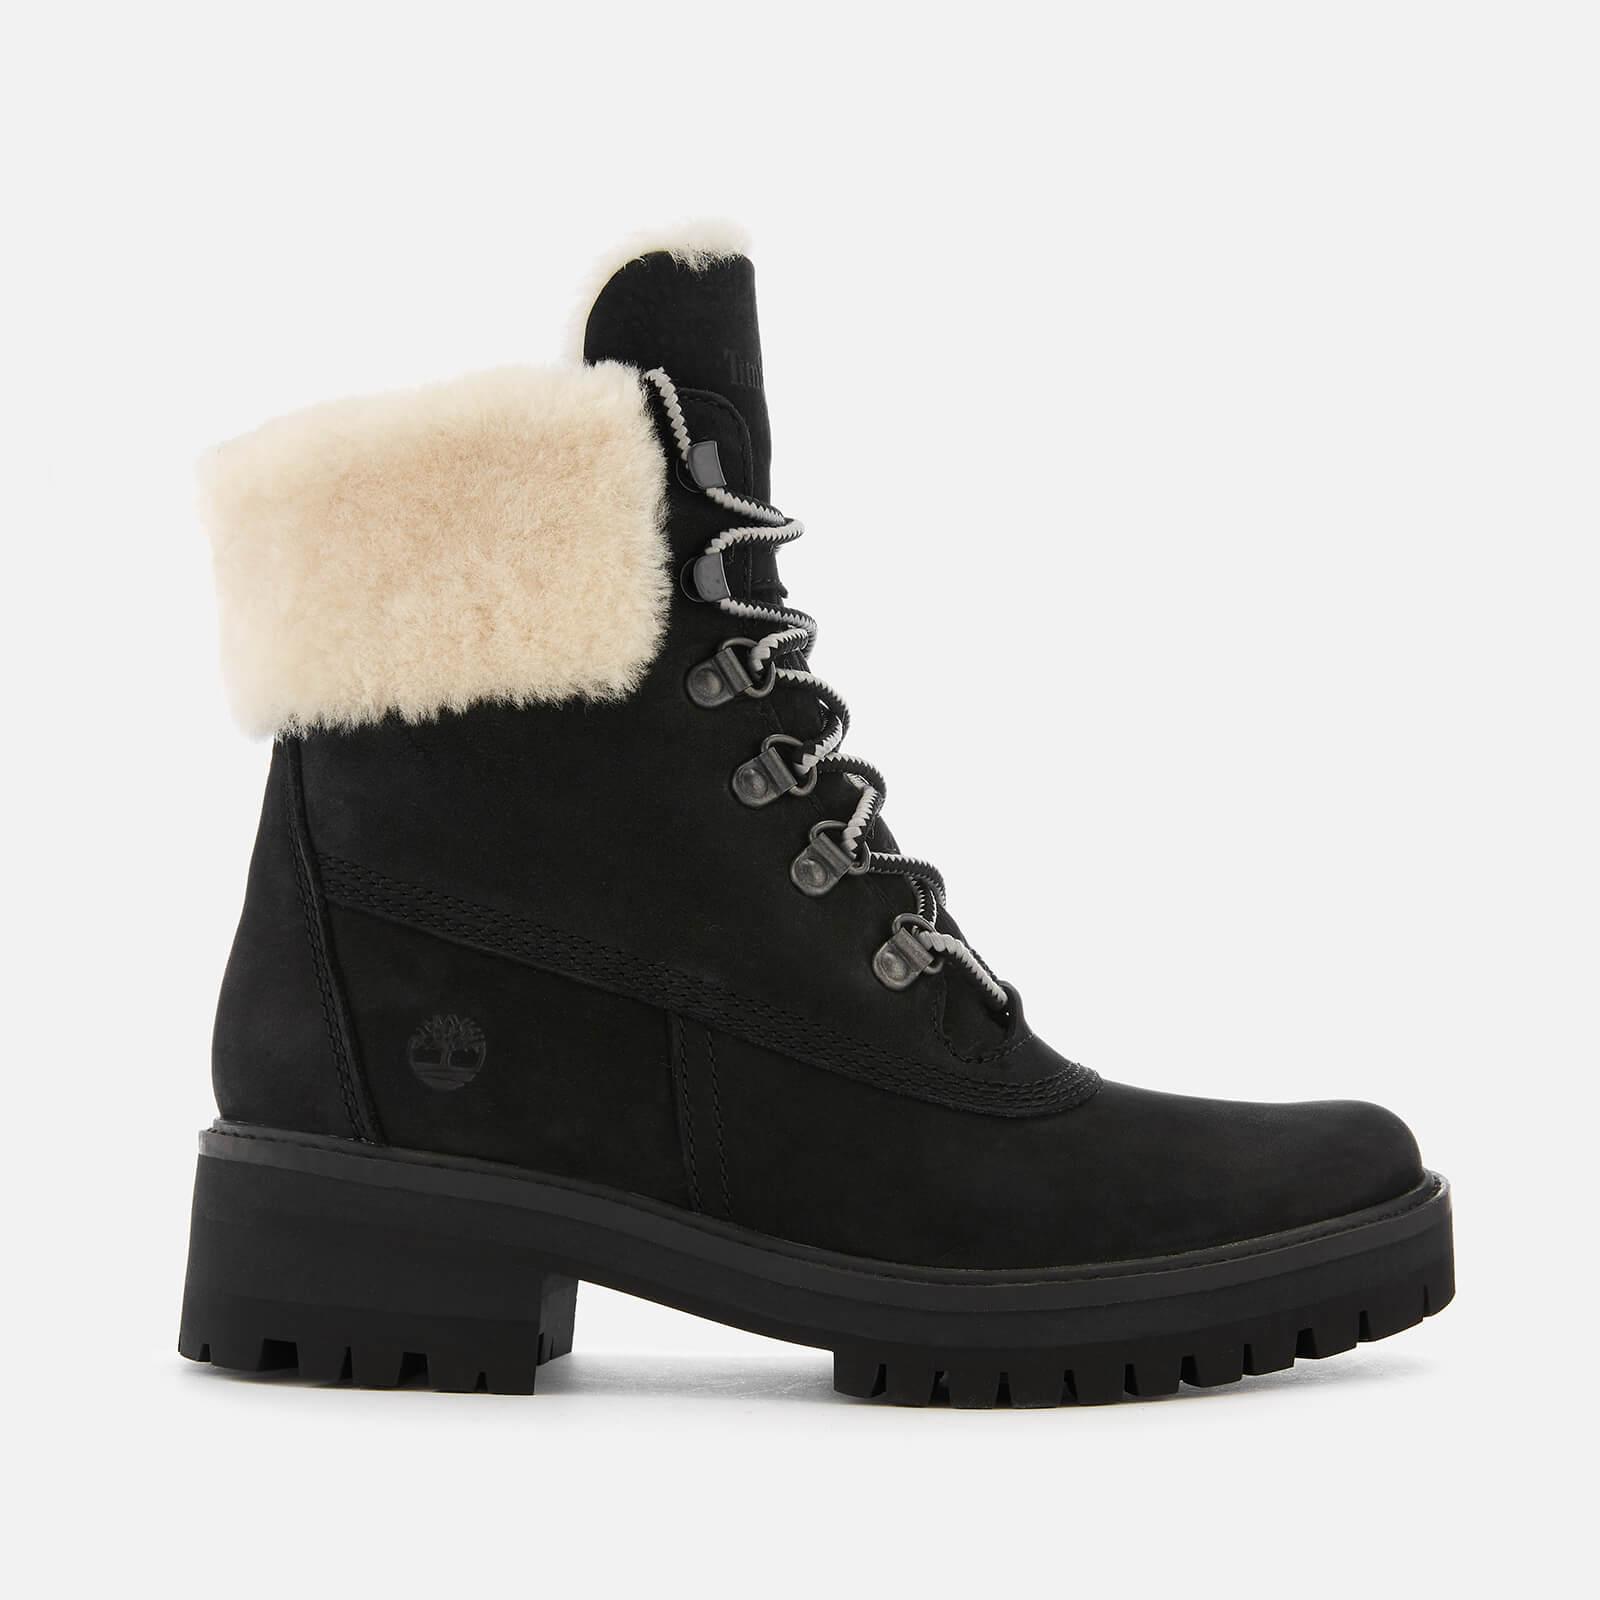 87f8c7283c5bda Timberland Women s Courmayeur Valley Shearling Lace Up Boots - Black Womens  Footwear